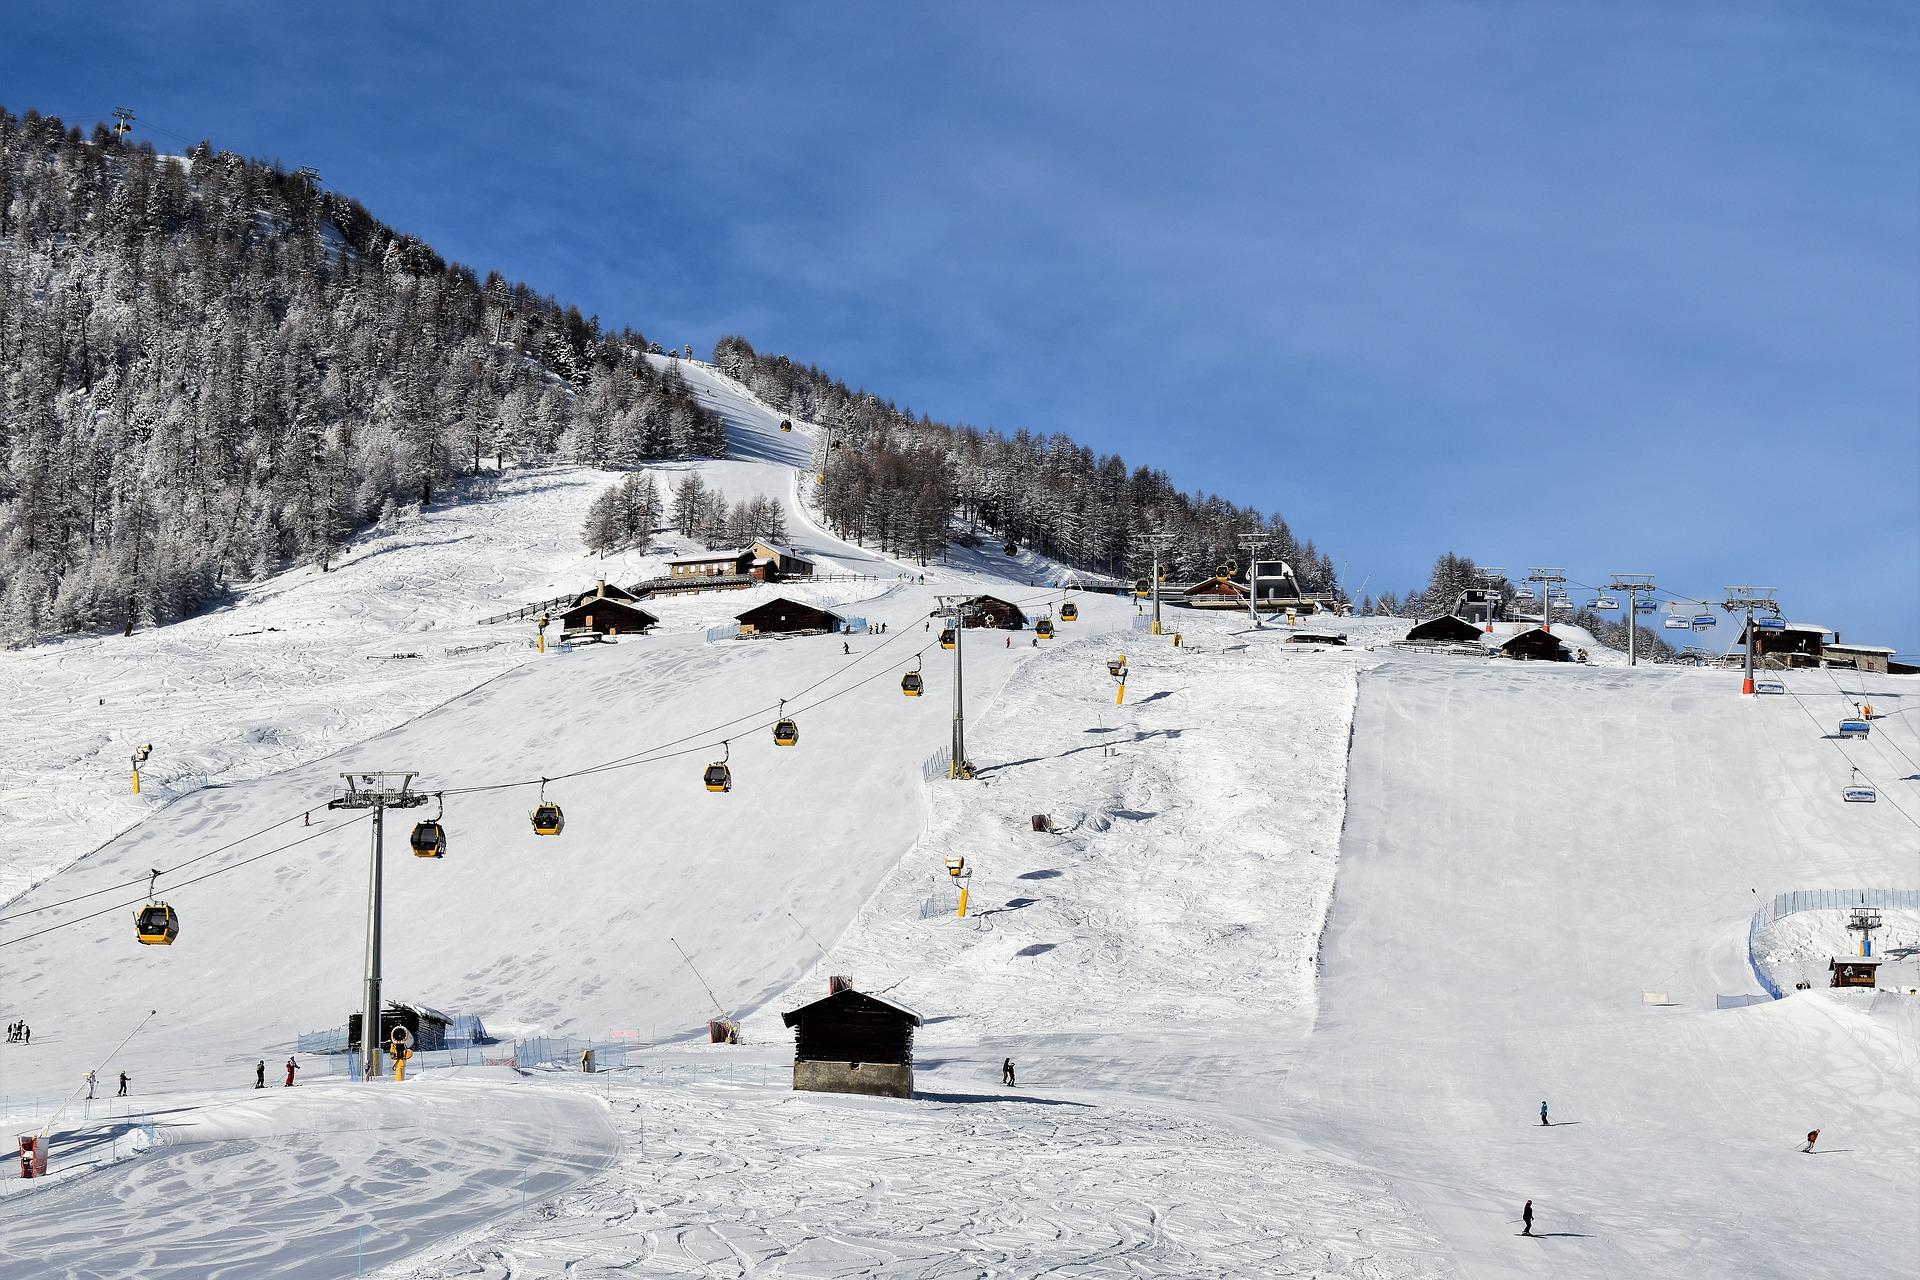 https://pixabay.com/ja/実行スキー-スキーリフト-スキー-雪砲-雪-風景-冬-自然-3901015/